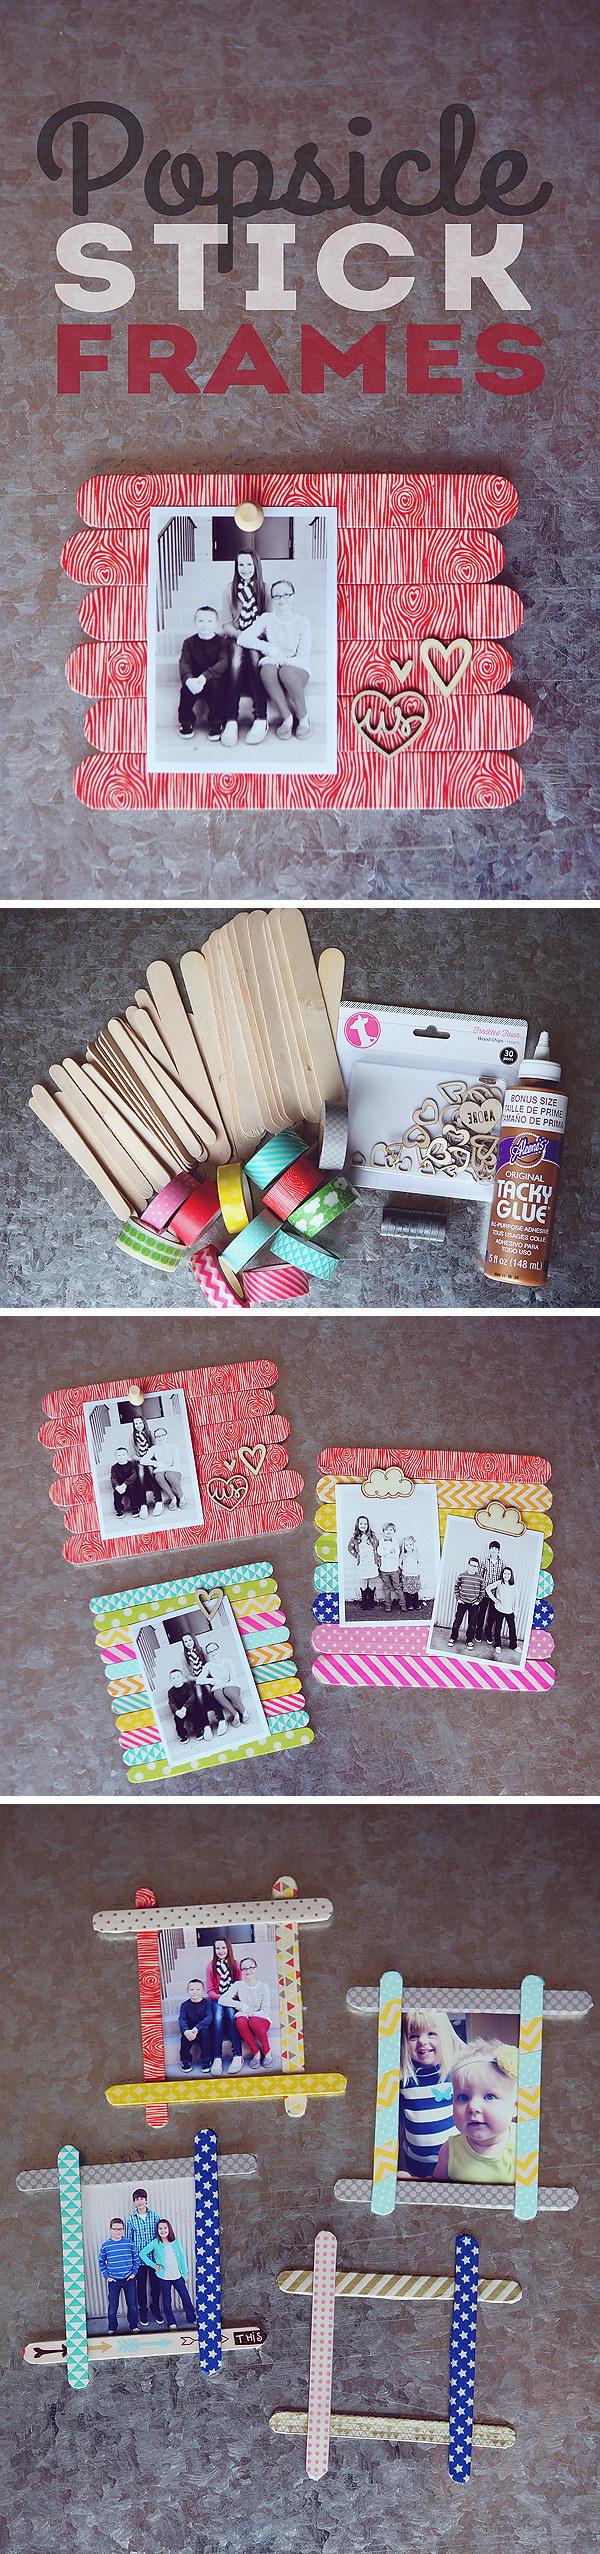 20 Popsicle Stick Frames